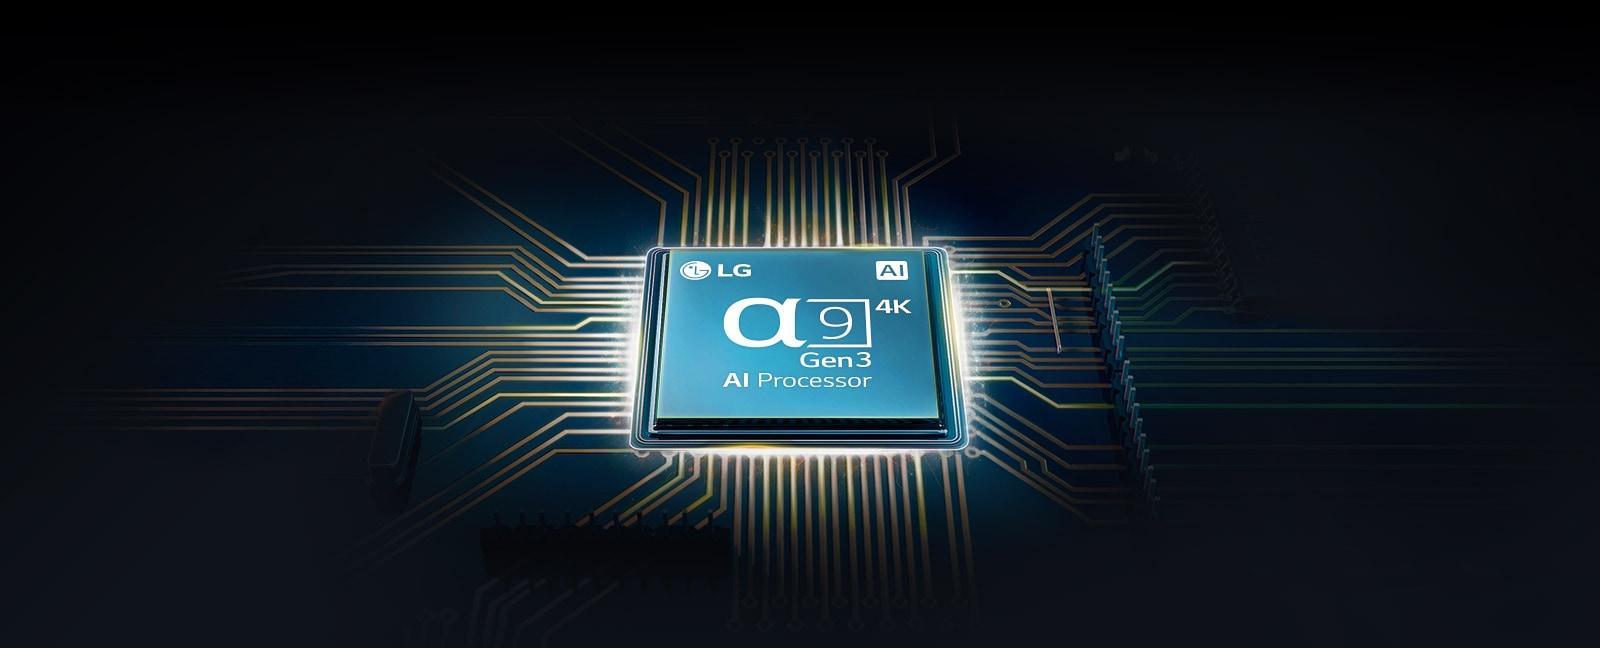 TV-OLED-CX-02-a9-Gen-3-AI-Processor-Desktop.jpg (1600×648)